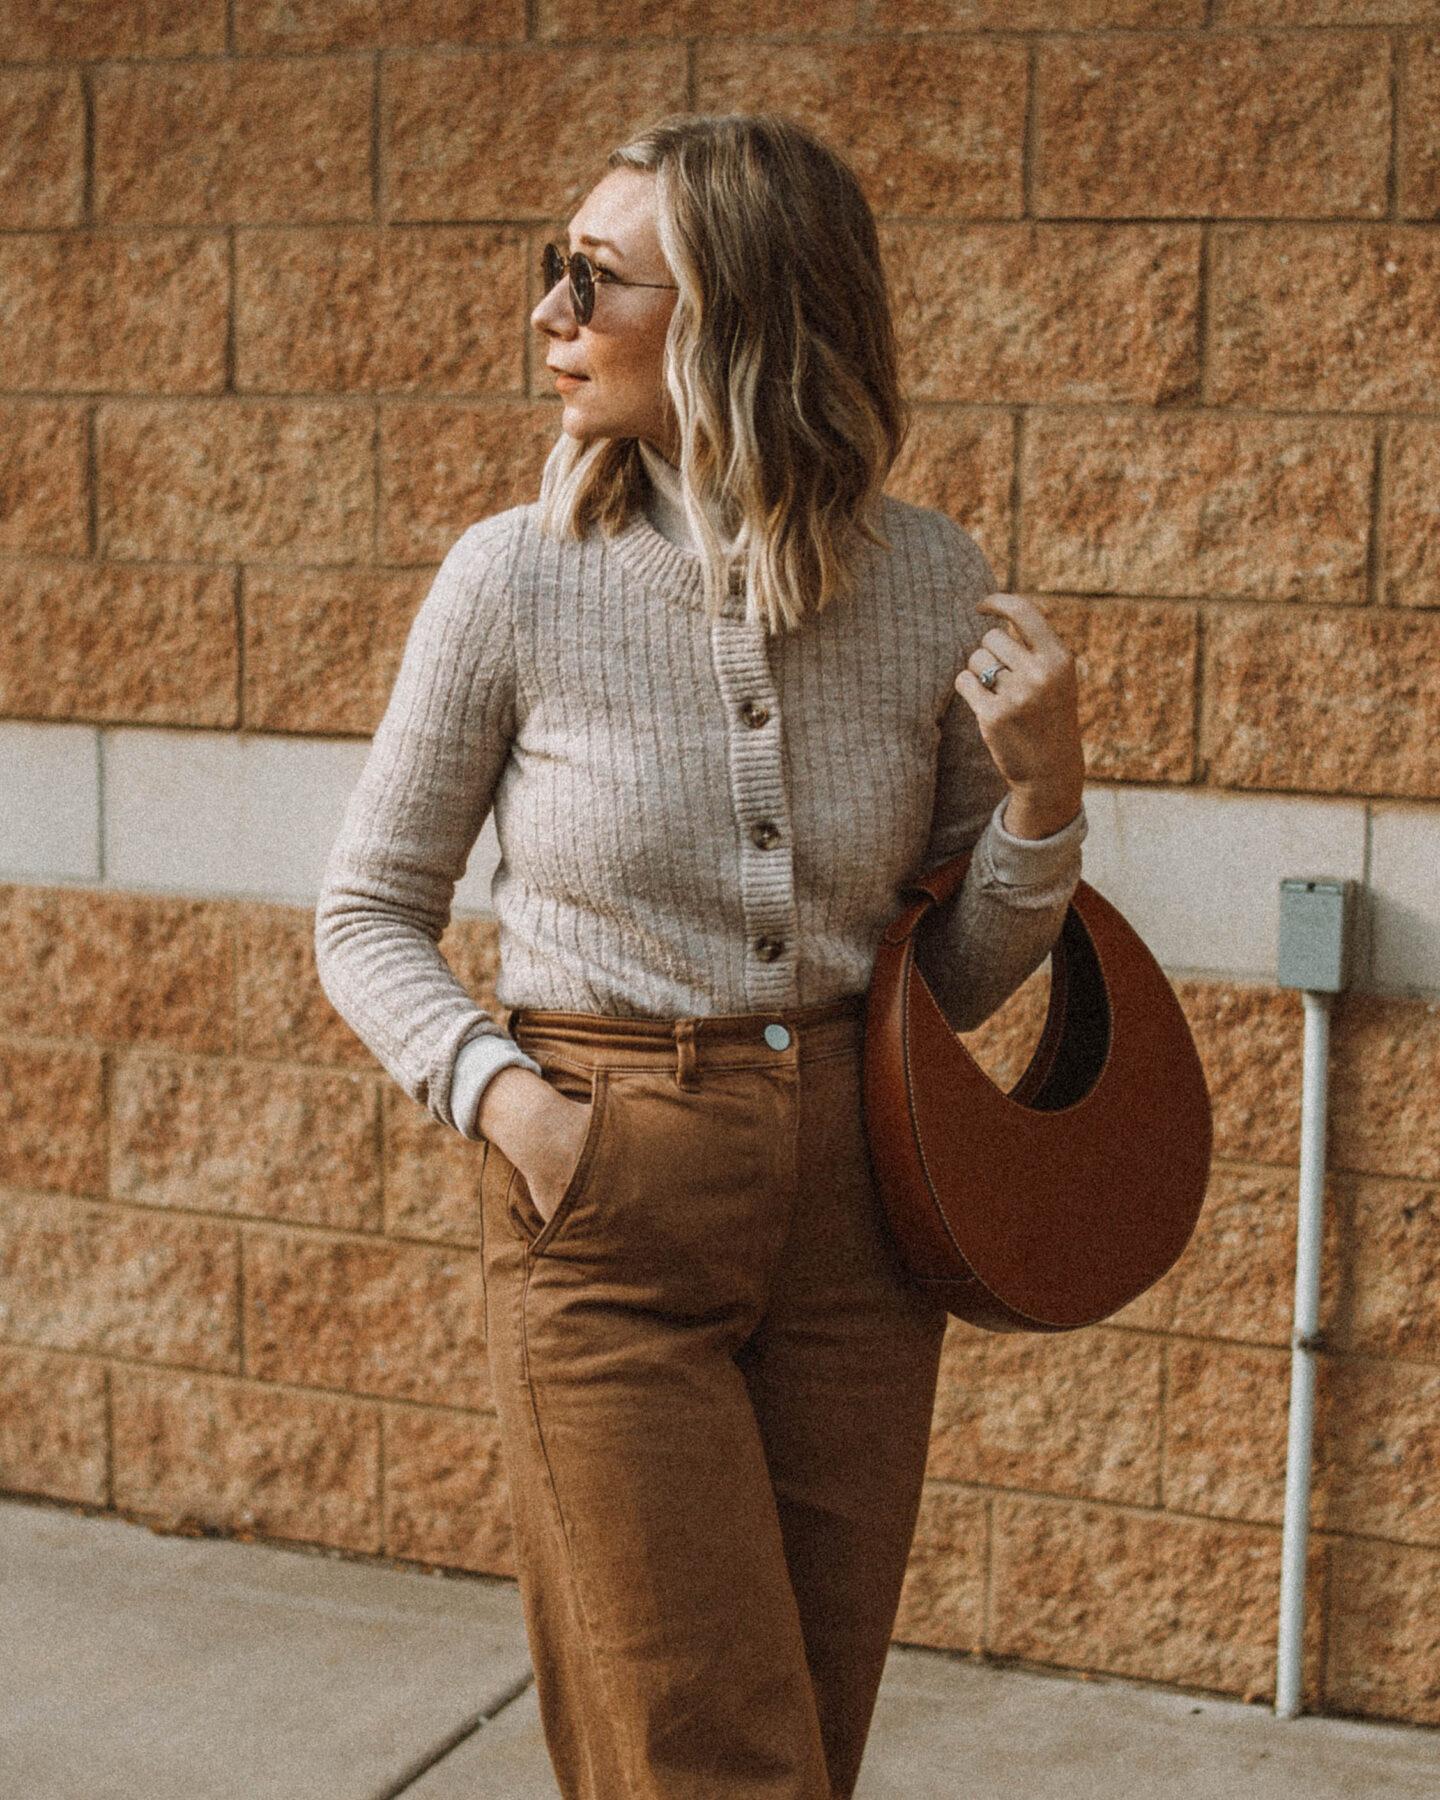 3 Ways to style Wide Leg Pants, Everlane Wide Leg Crop Pant, Staud Moon Bag